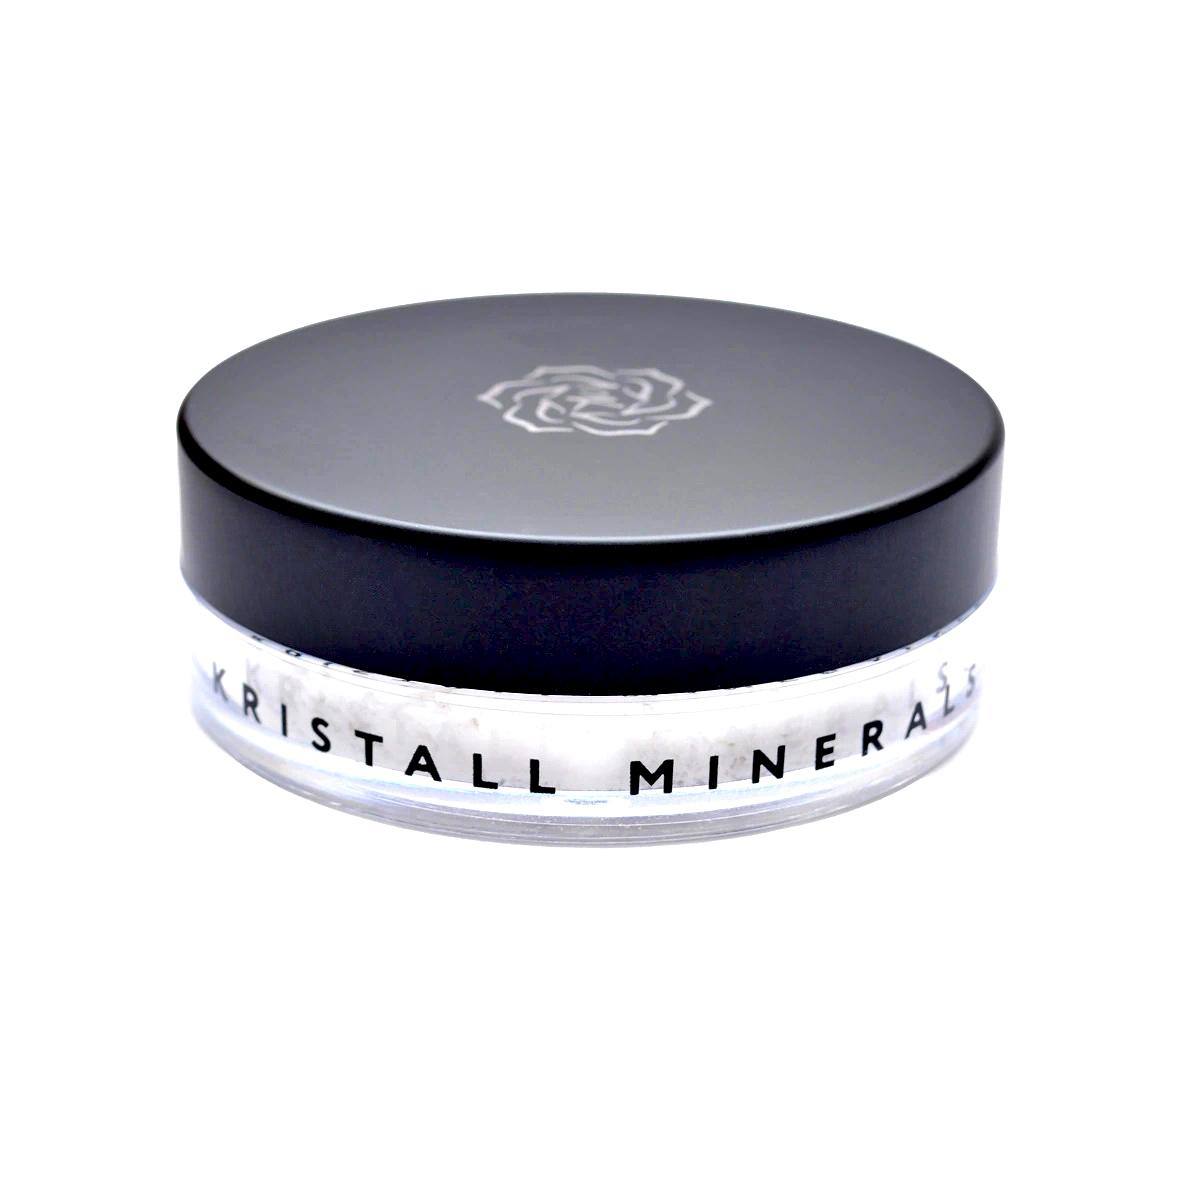 Kristall Minerals cosmetic